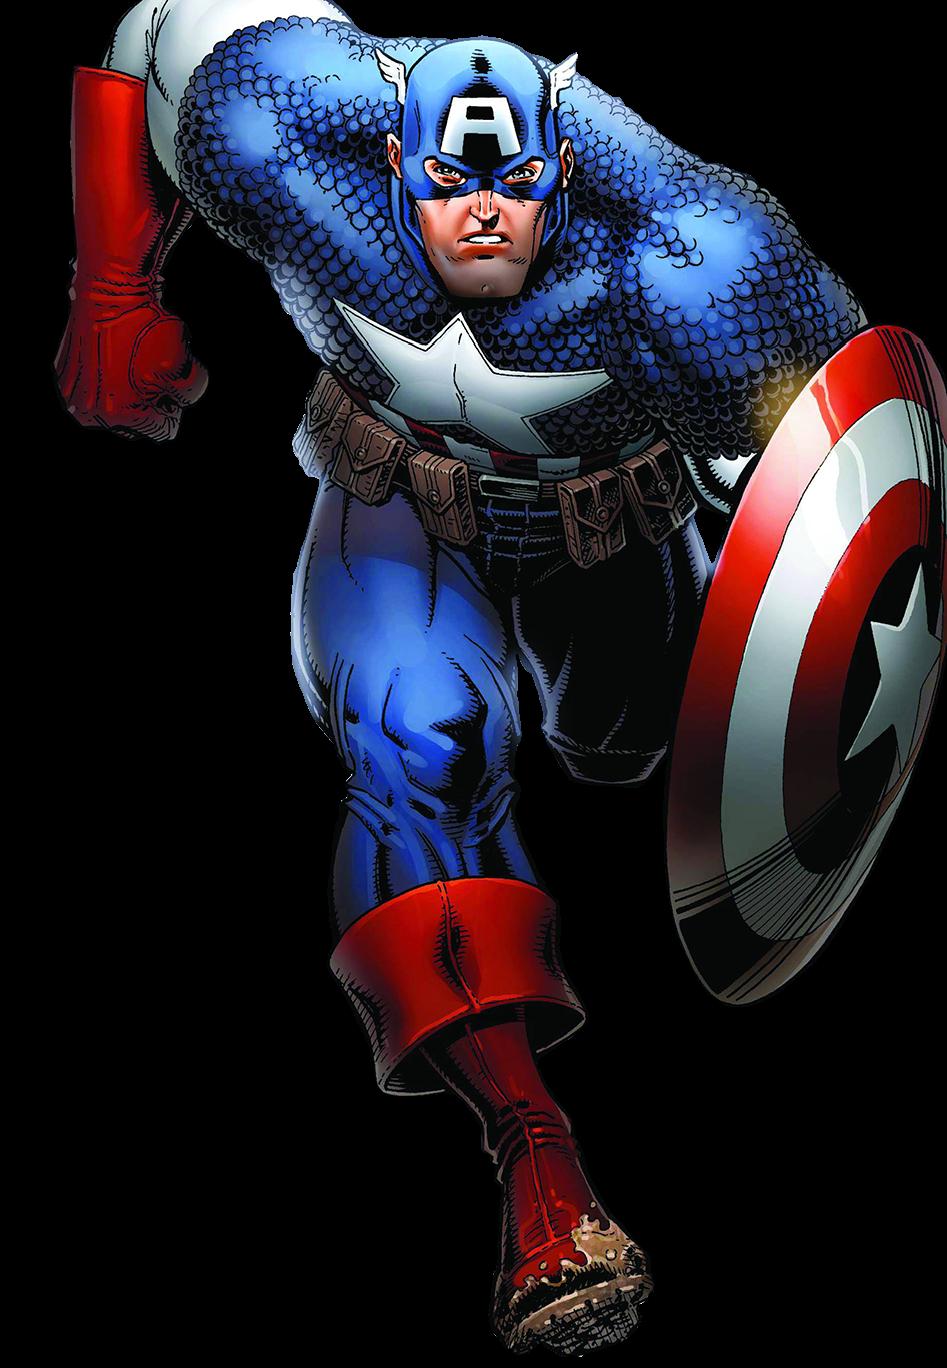 Marvel comic book clipart banner freeuse download Marvel Captain America PNG Image - PurePNG   Free transparent CC0 ... banner freeuse download